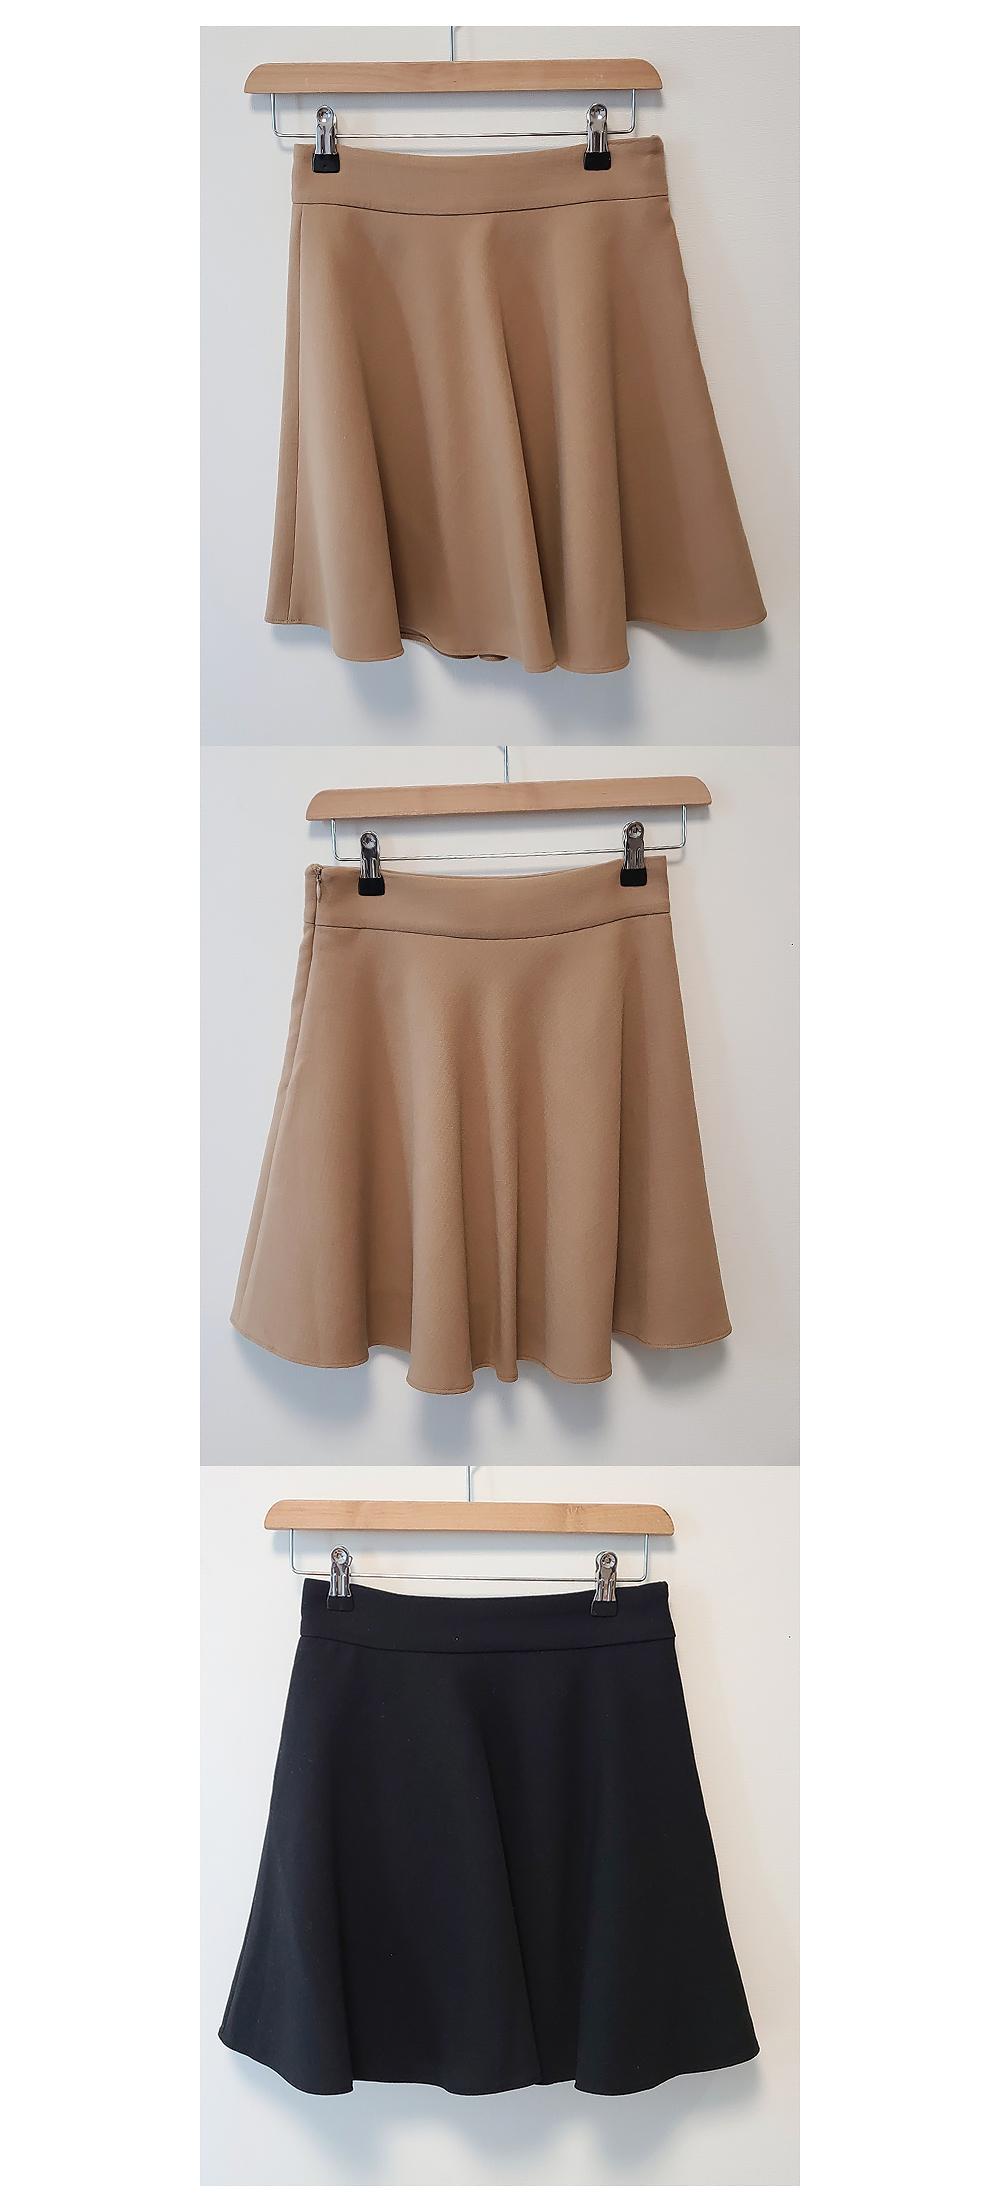 skirt brown color image-S1L2